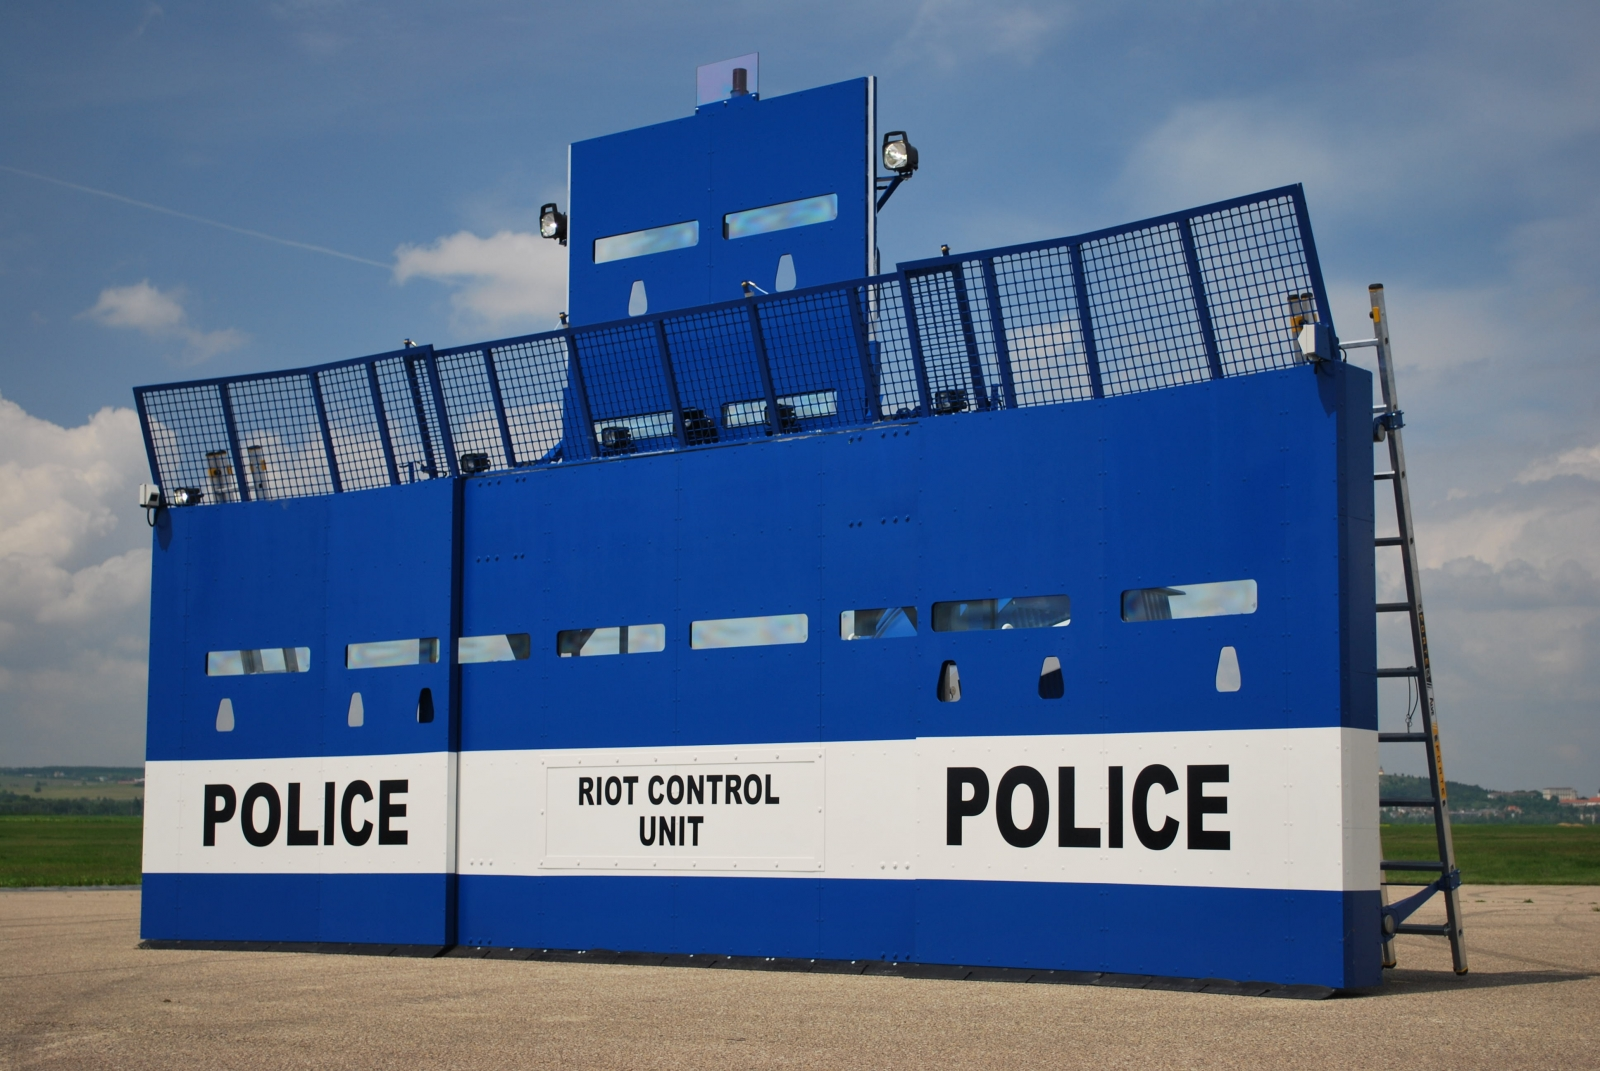 Bozena Riot anti-riot system shield